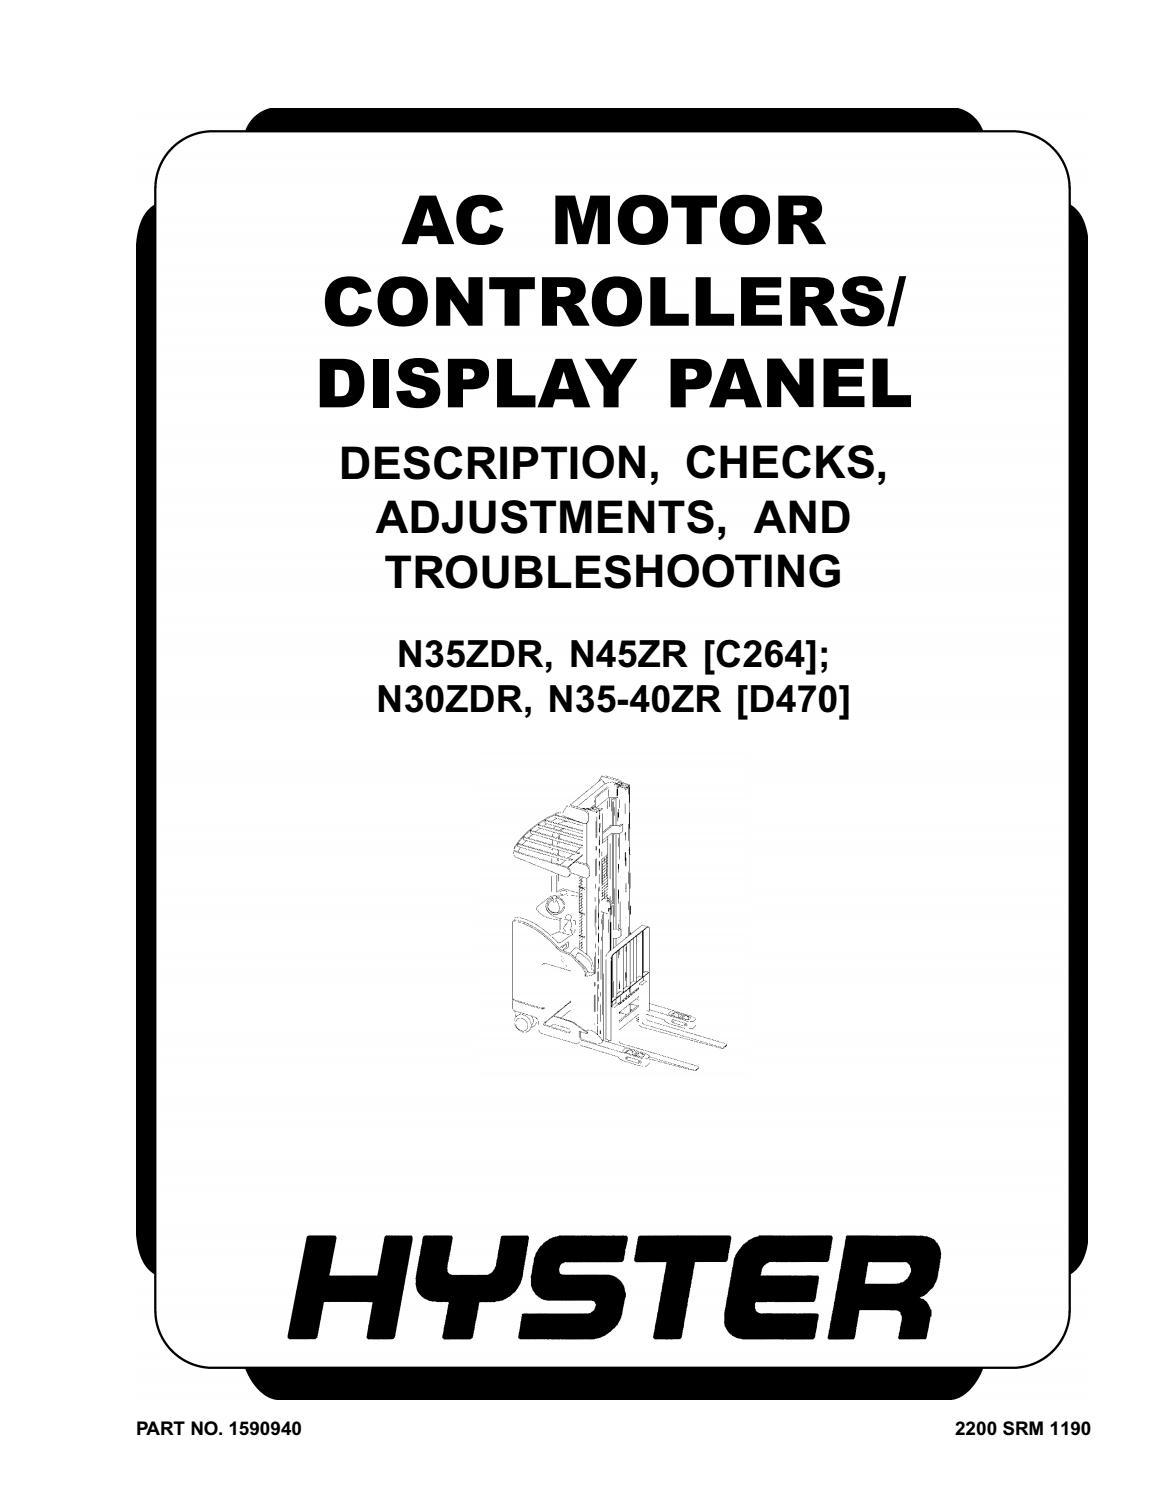 Hyster Forklift N30ZDRS, N35-40ZRS(A265) N35ZDR, N45ZR(C264) N30ZDR,  N35-40ZR(D470) service manual by heydownloads - issuu | Hyster Monitor Wiring Diagram |  | Issuu